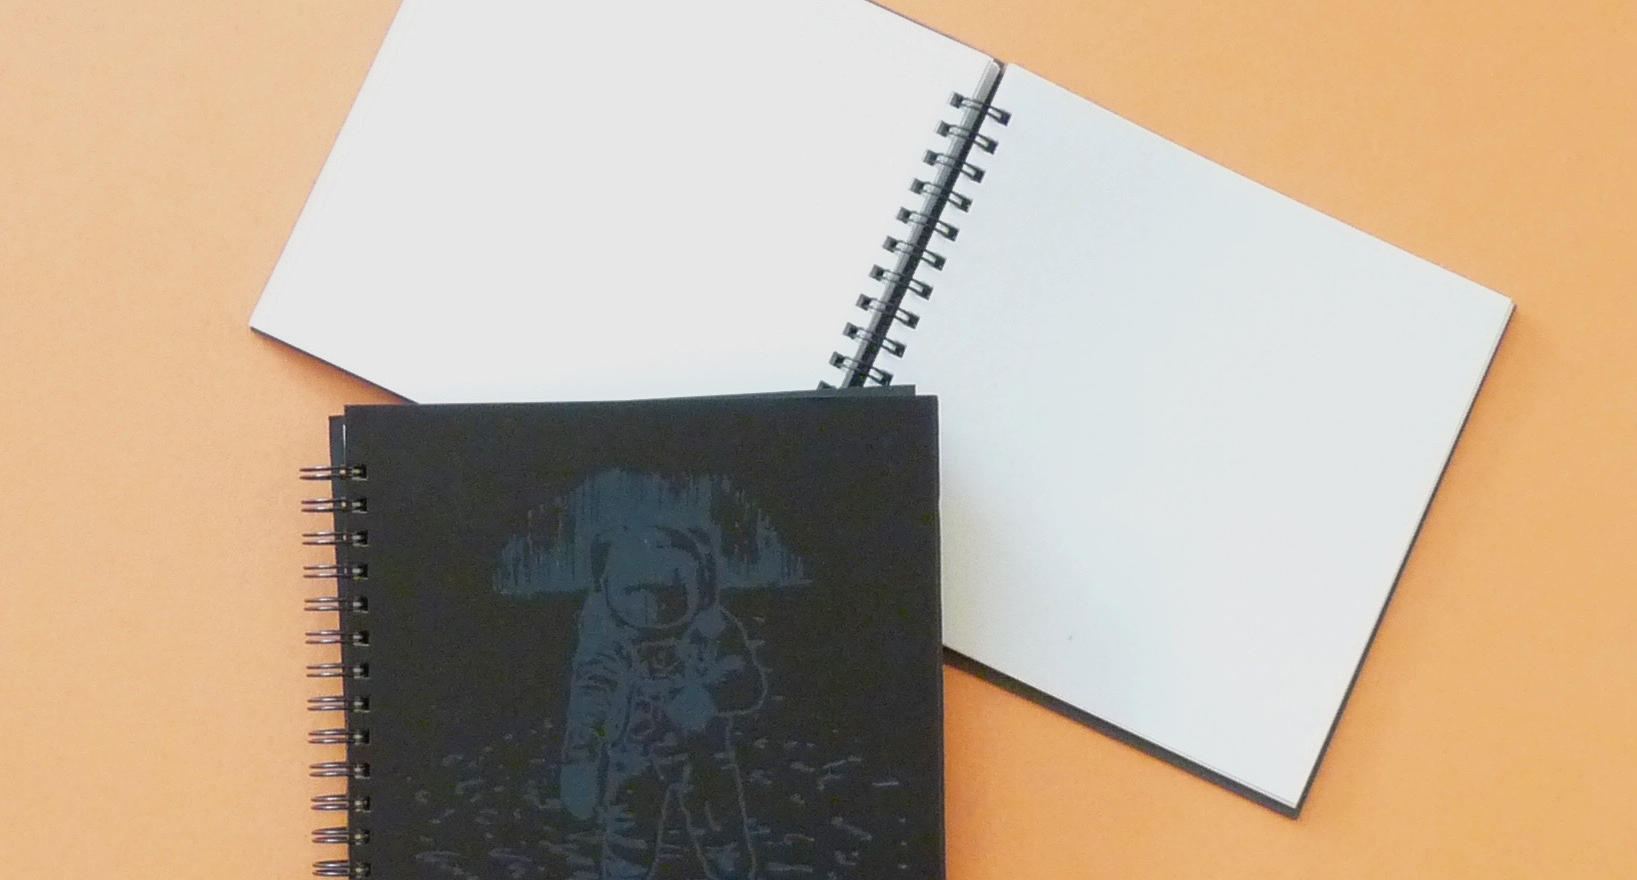 Black spaceman book